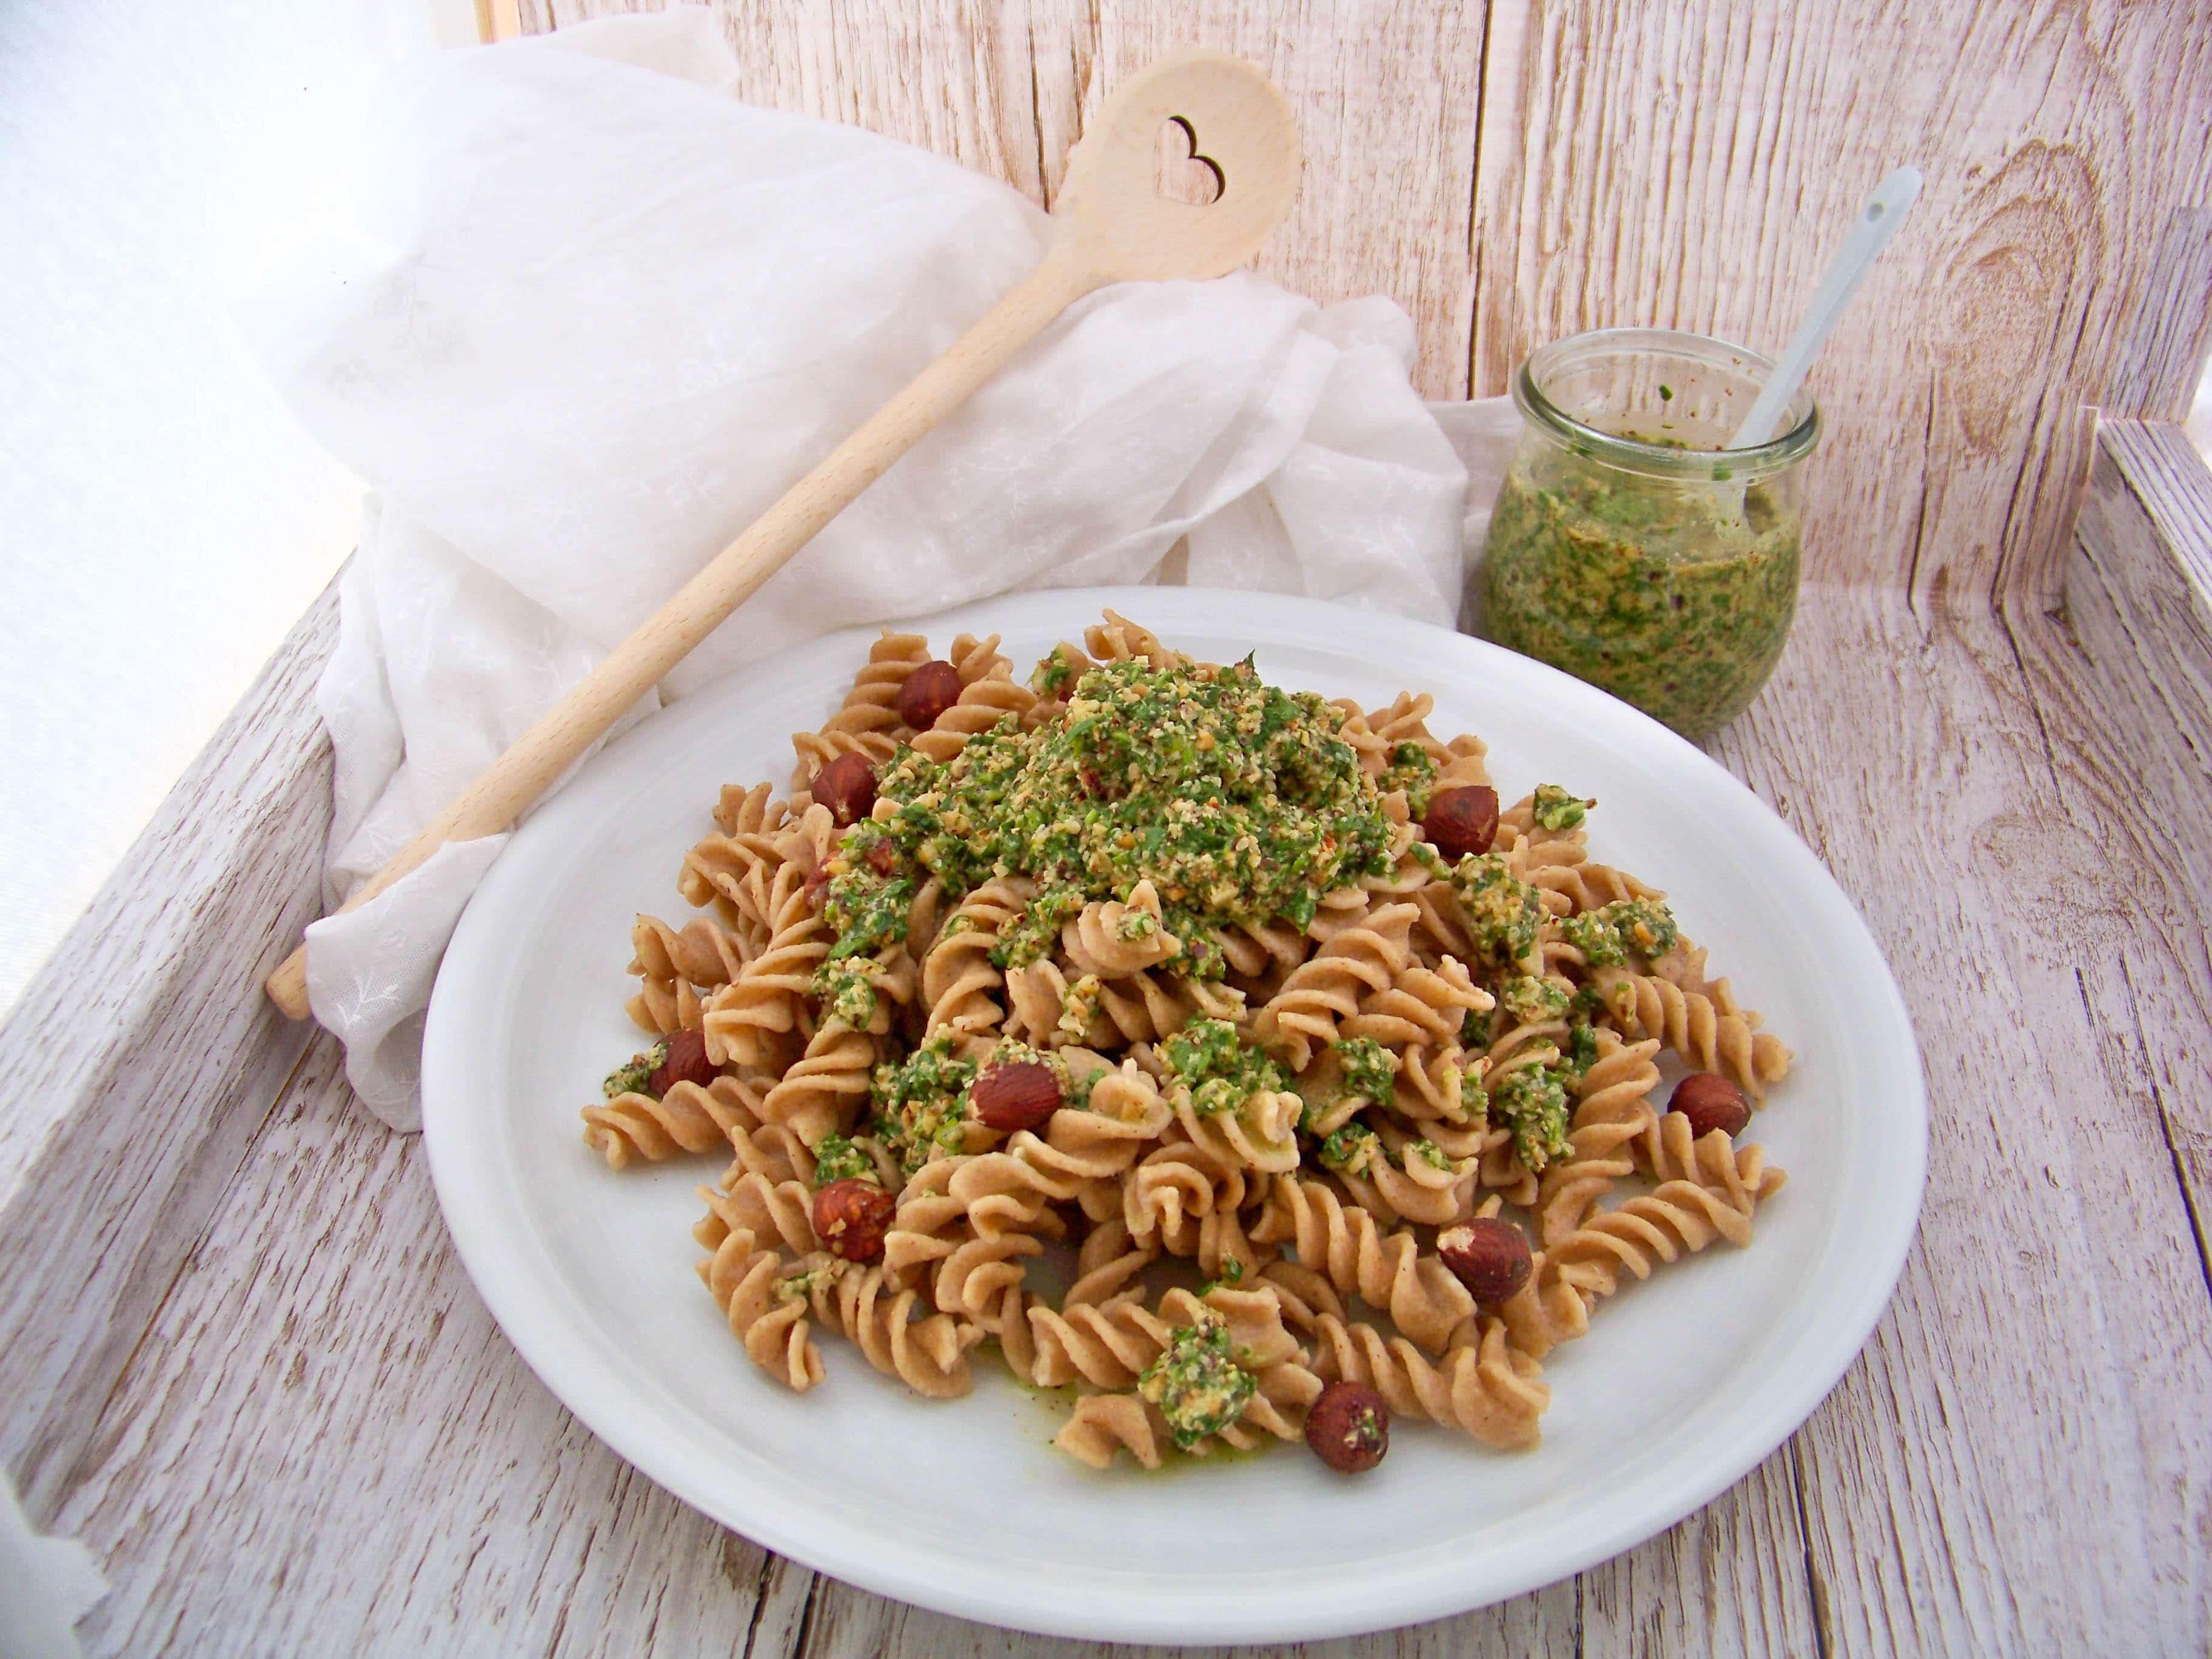 Nudeln mit Rucola-Haselnuss-Pesto, Nuss-Pesto selber machen, Haselnüsse